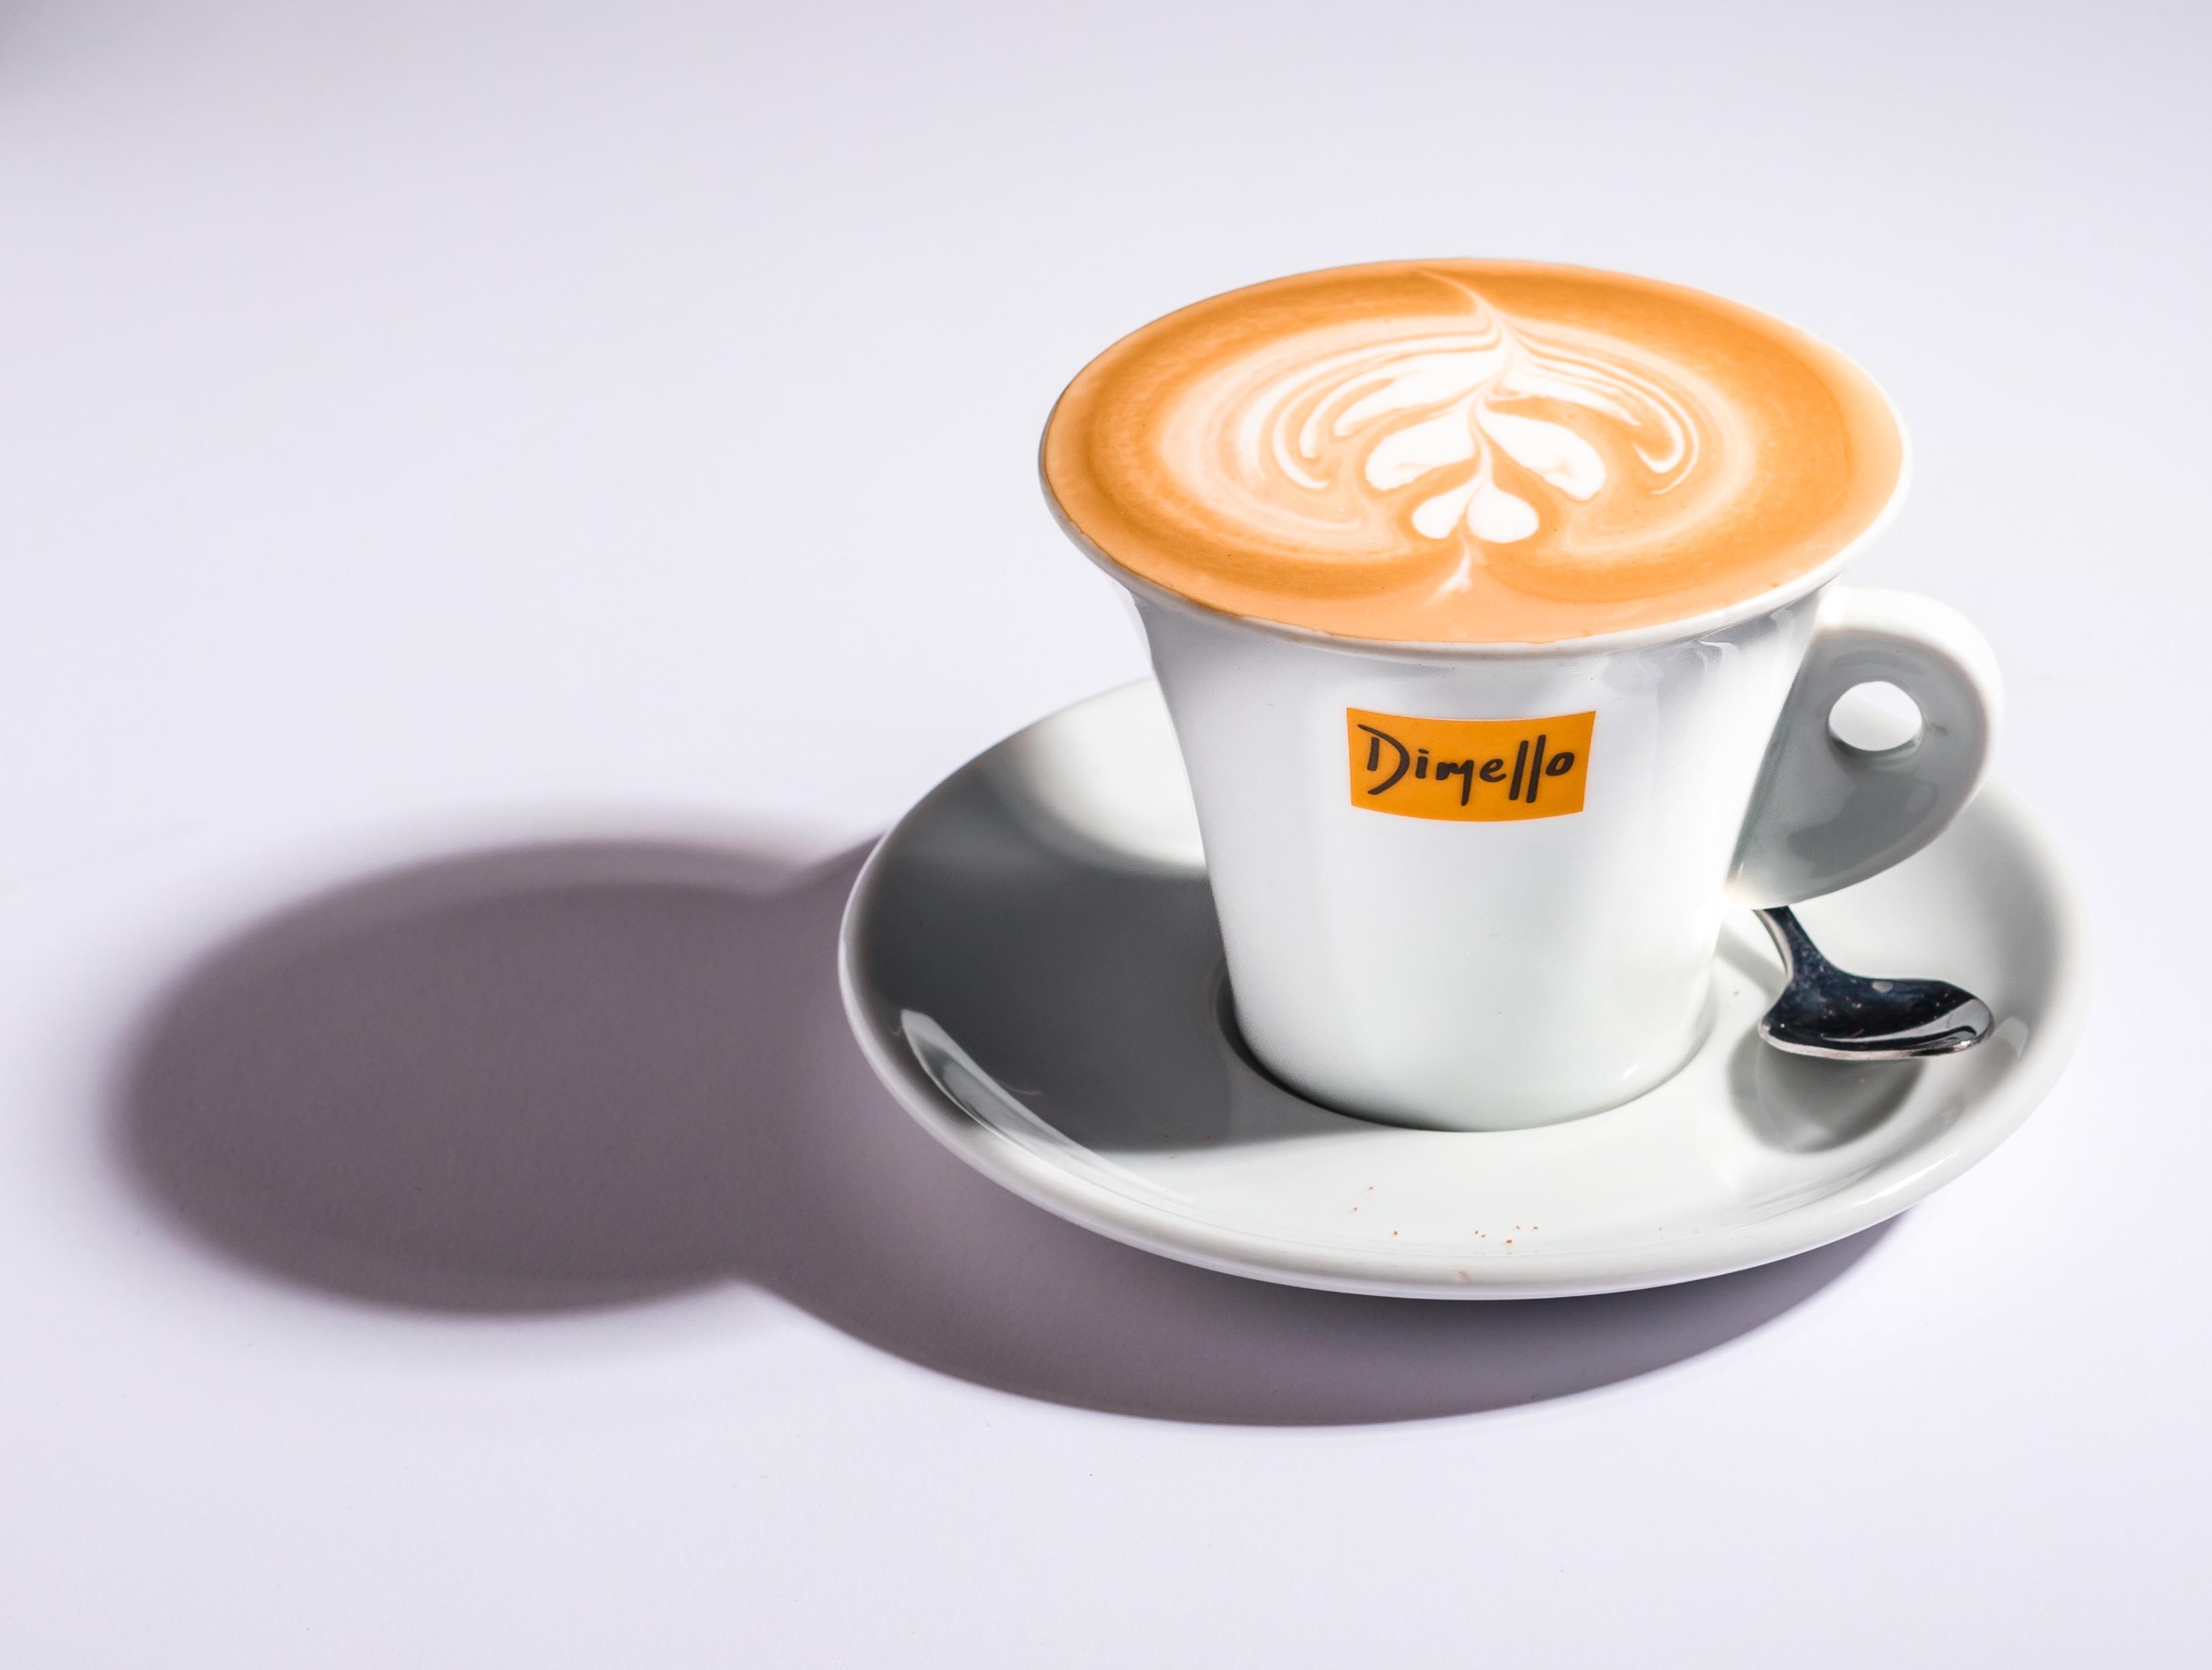 Public Cafe coffee franchise